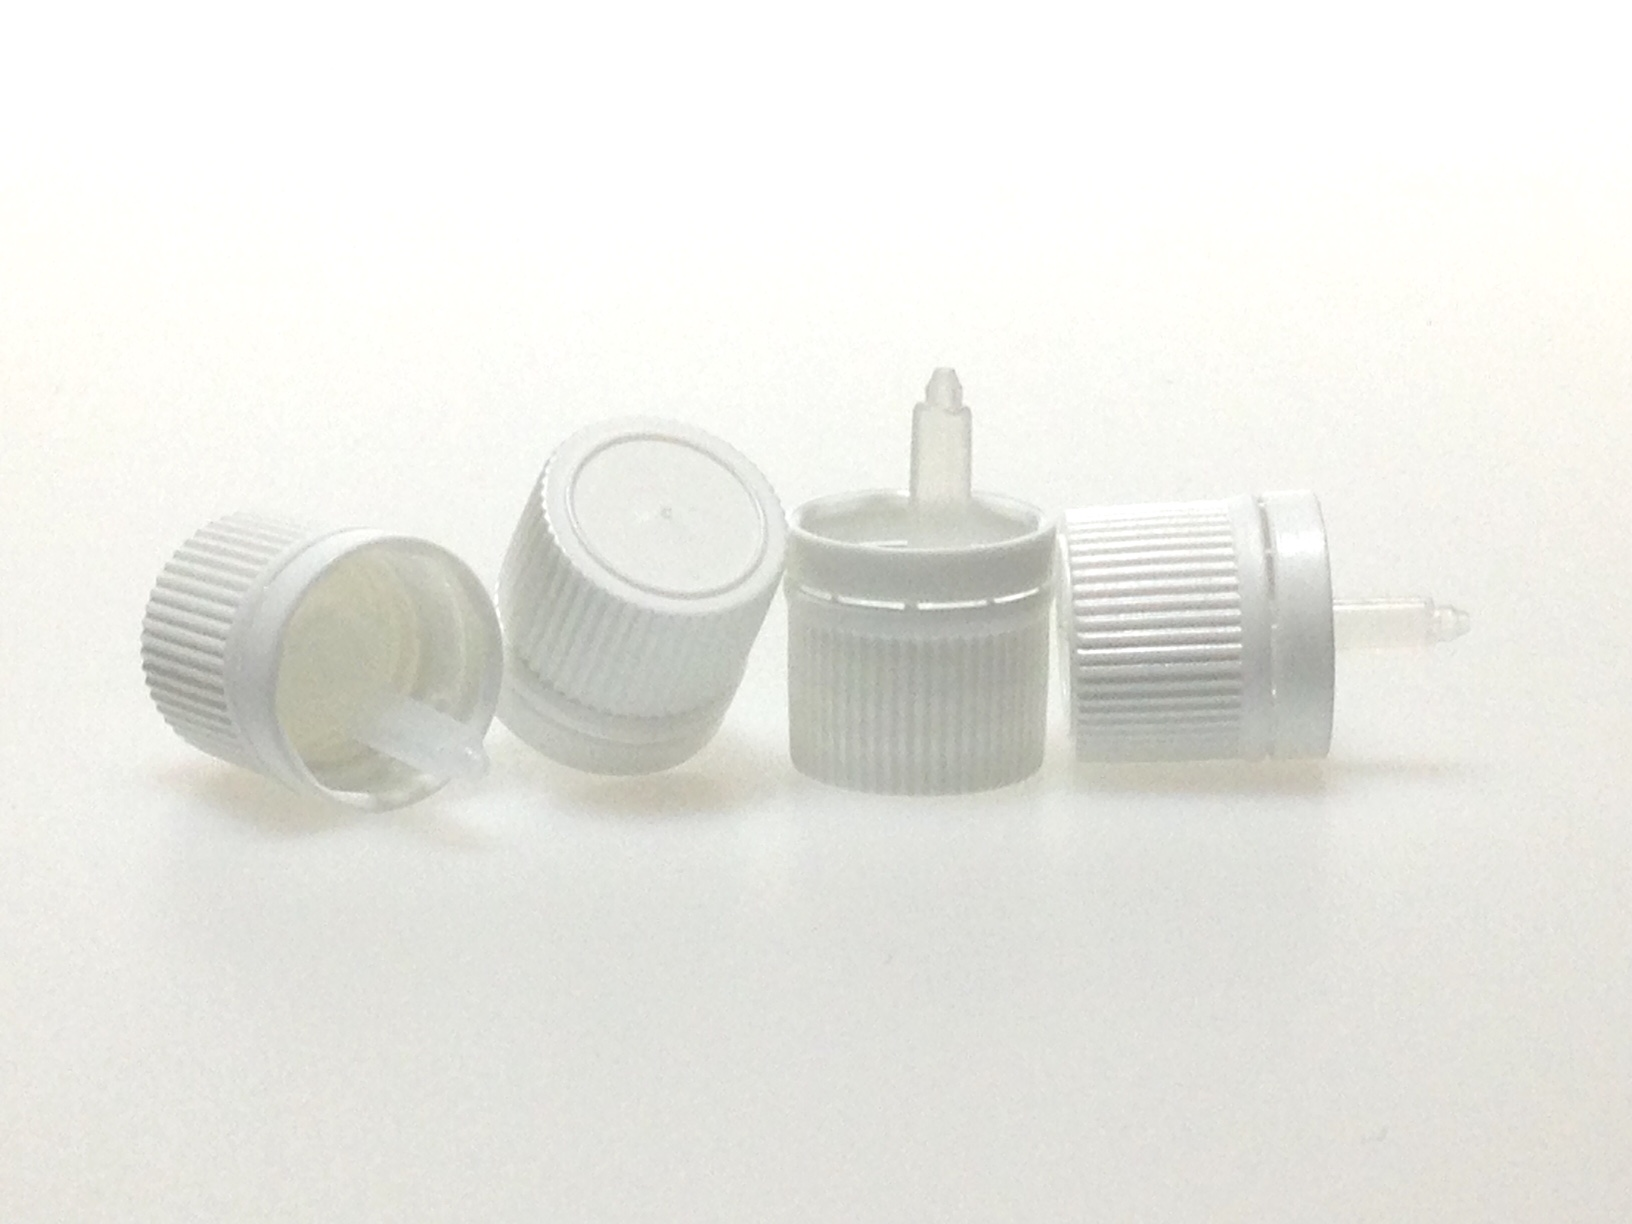 CAPSULE COMPTE GOUTTE INVIOLABLE PE BLANC DIN18 Insert 1230 (base hydro-alcoolique)